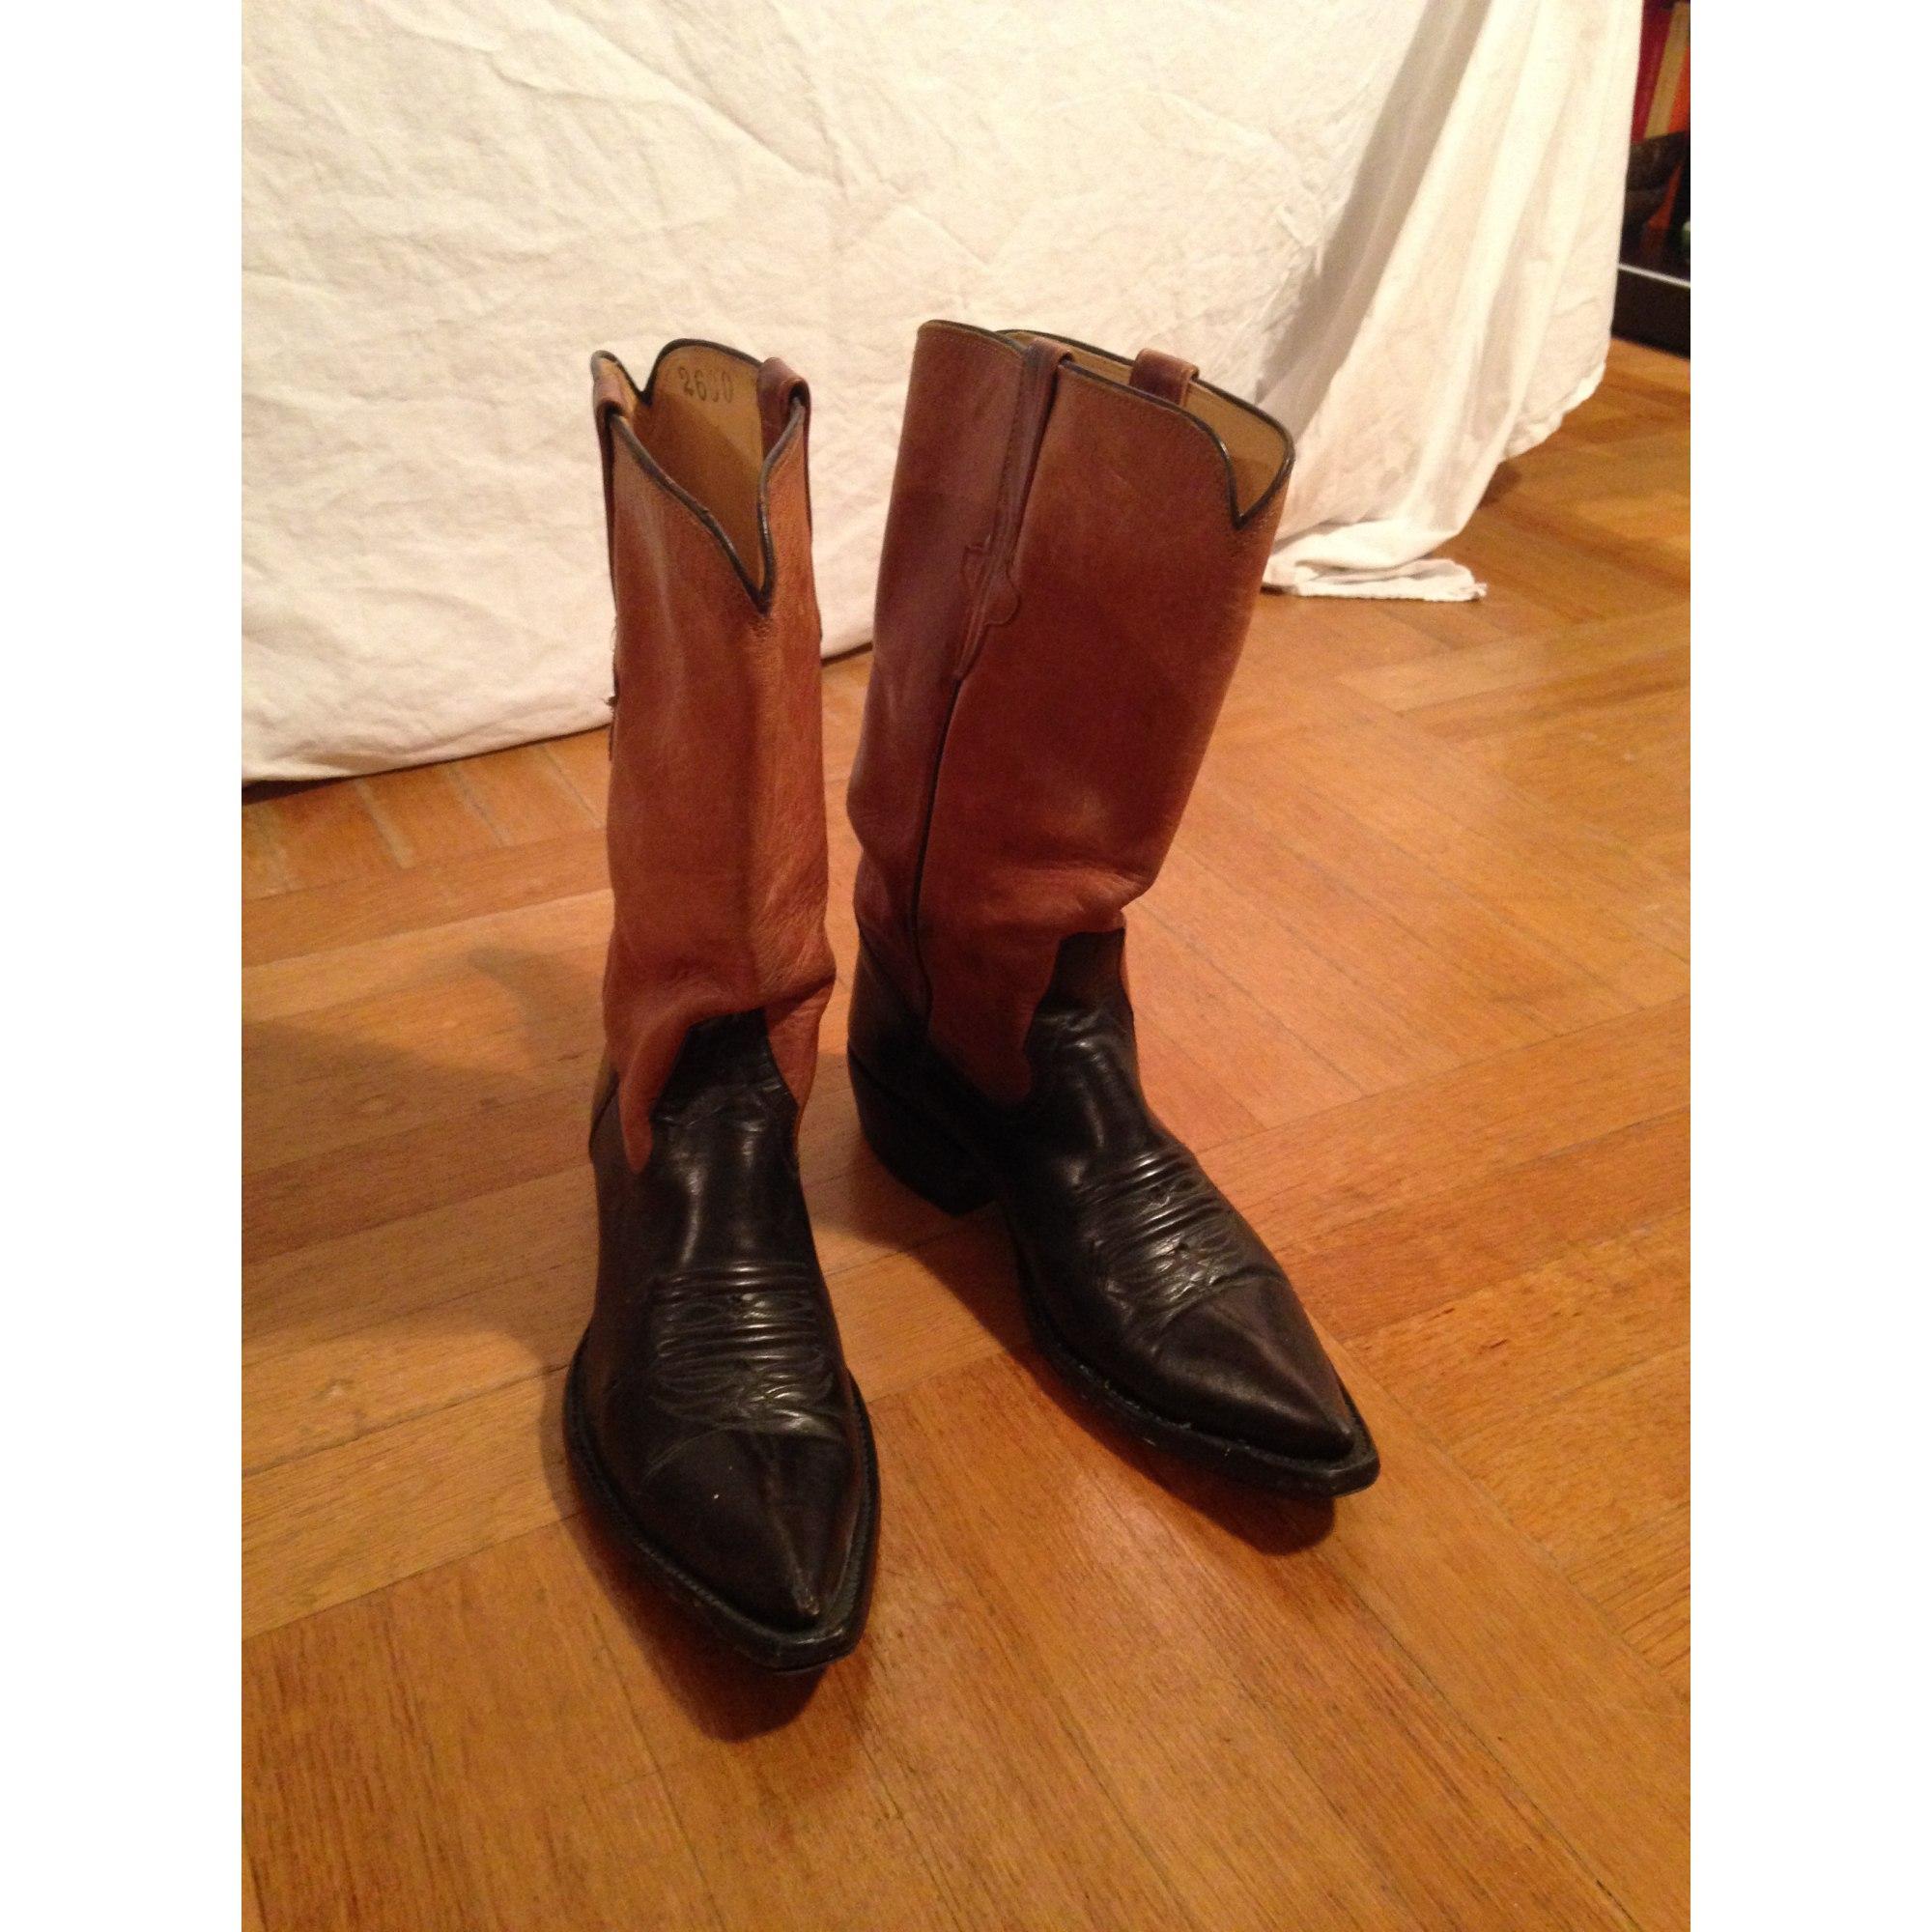 SantiagsBottinesLow Boots SantiagsBottinesLow Boots Cowboy Cowboy SantiagsBottinesLow Cowboy Cowboy Cowboy Boots Boots SantiagsBottinesLow SantiagsBottinesLow Boots SantiagsBottinesLow ARLj4q35